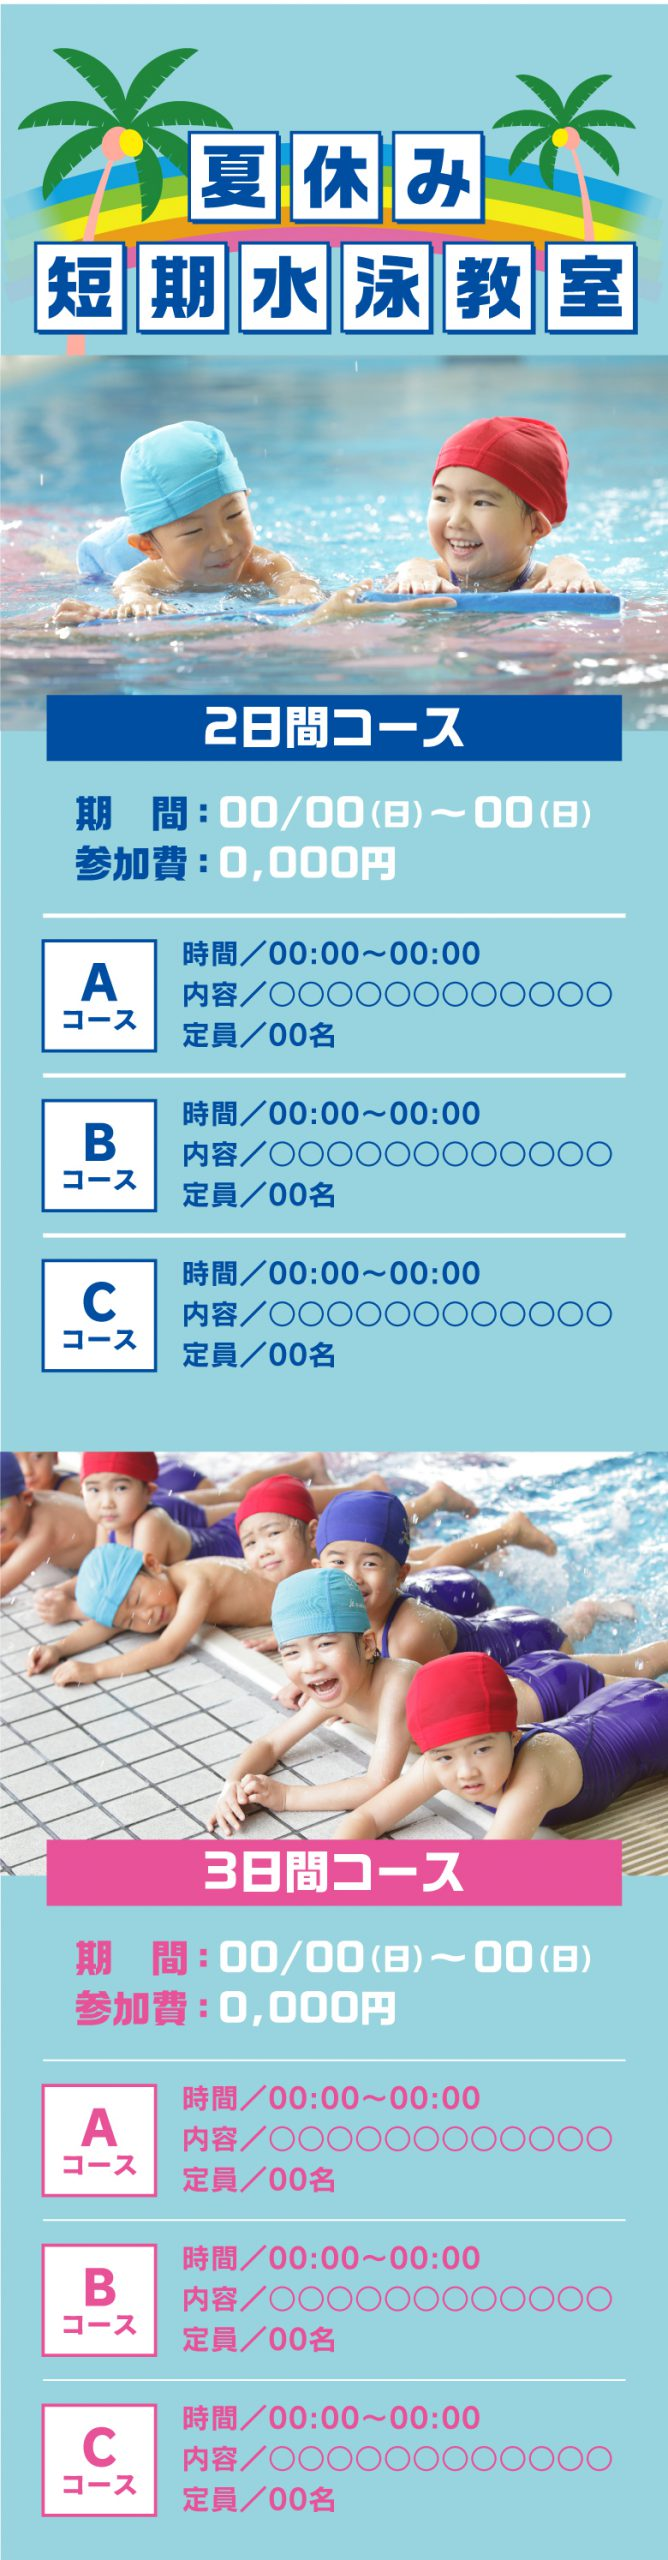 cd-cv-ch-21n-lp-class-02